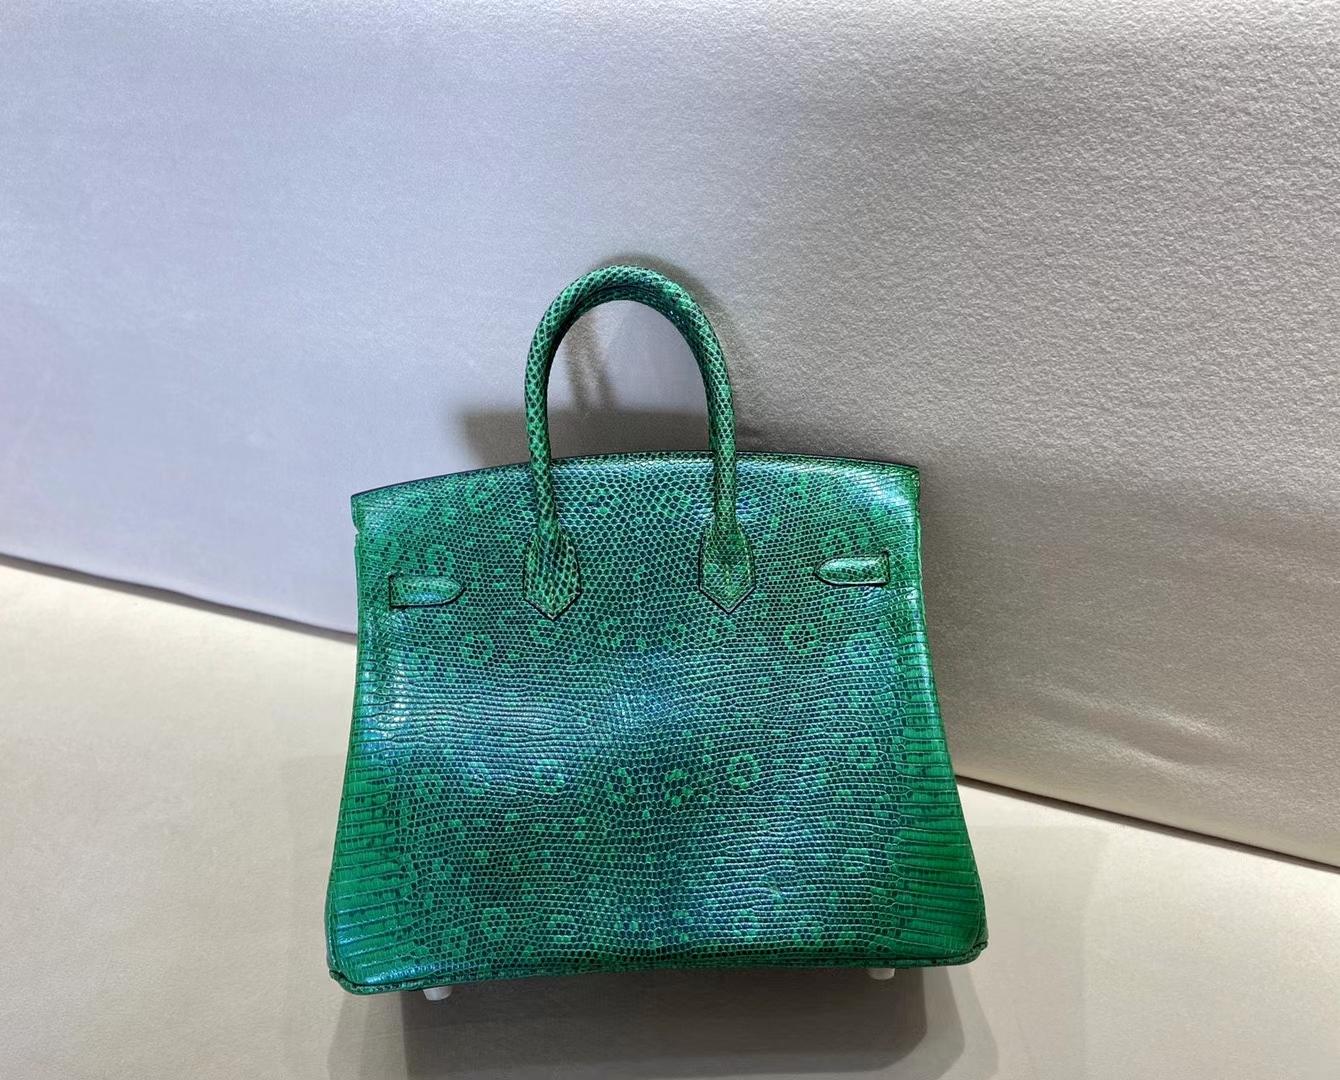 Hermès(爱马仕)birkin 25cm 祖母绿渐变 雪花色 金扣 顶级纯手工